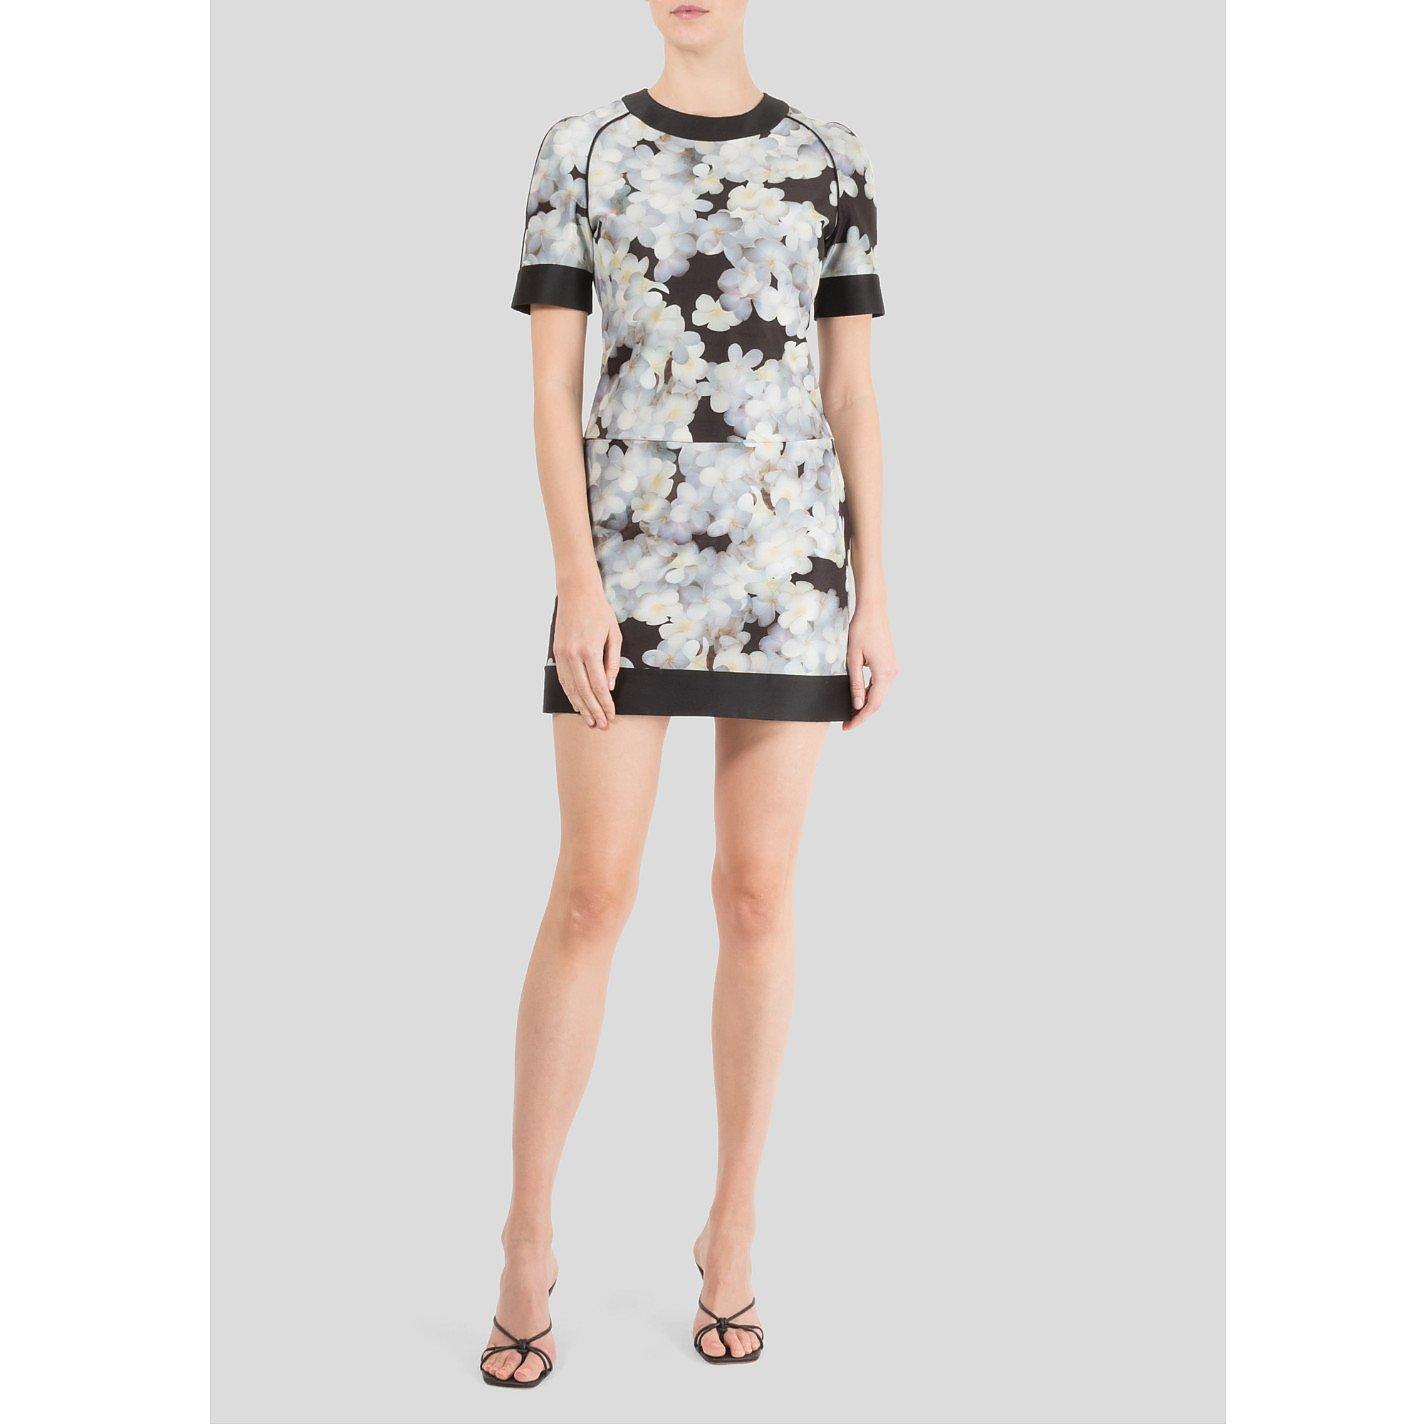 Victoria Beckham Short Sleeved Floral Mini Dress